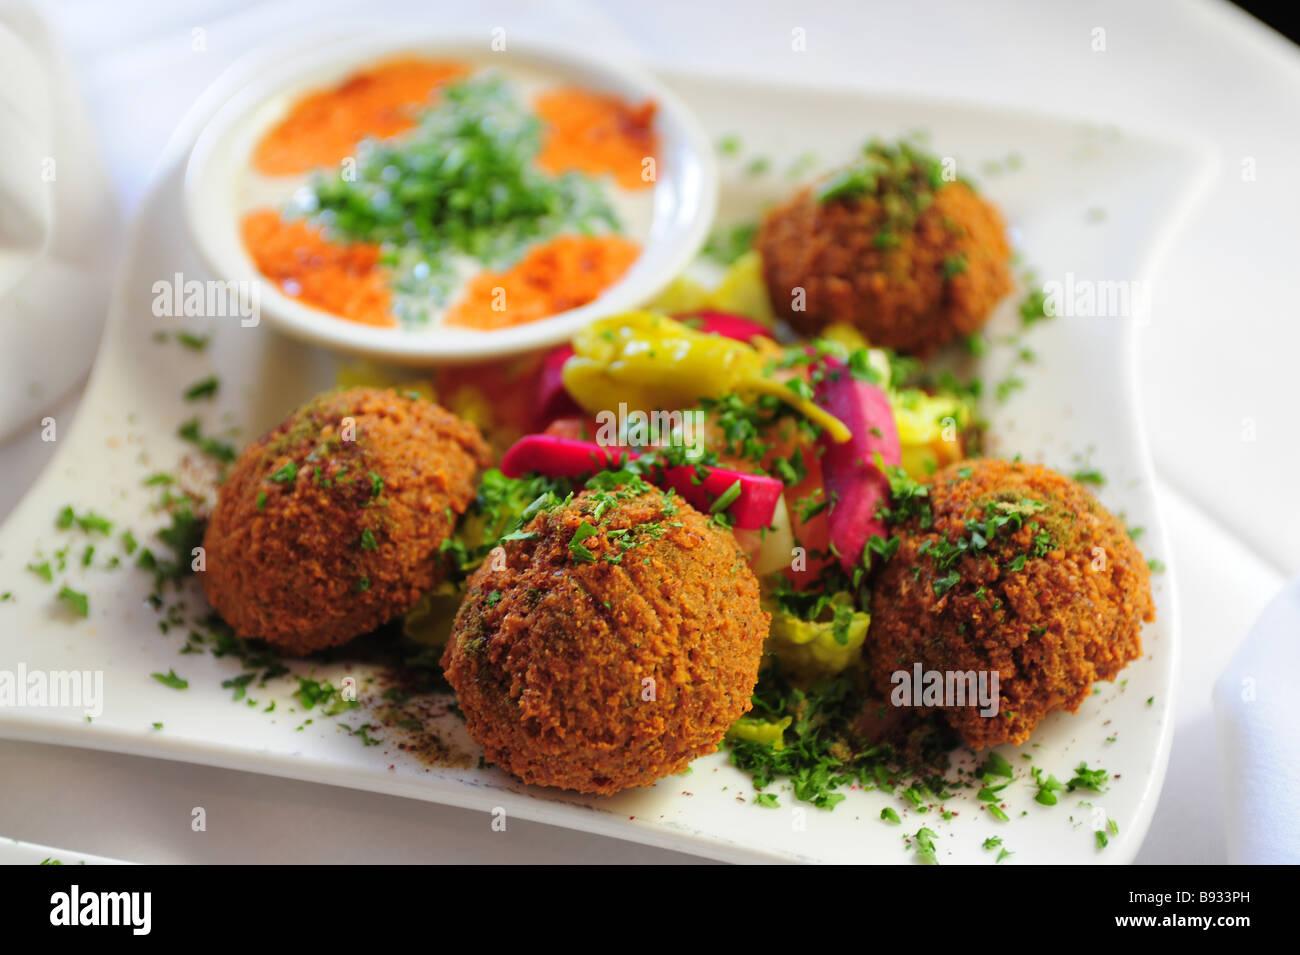 Falafel und Tahini dipping sauce Nahost Nahrungsmittel Stockfoto